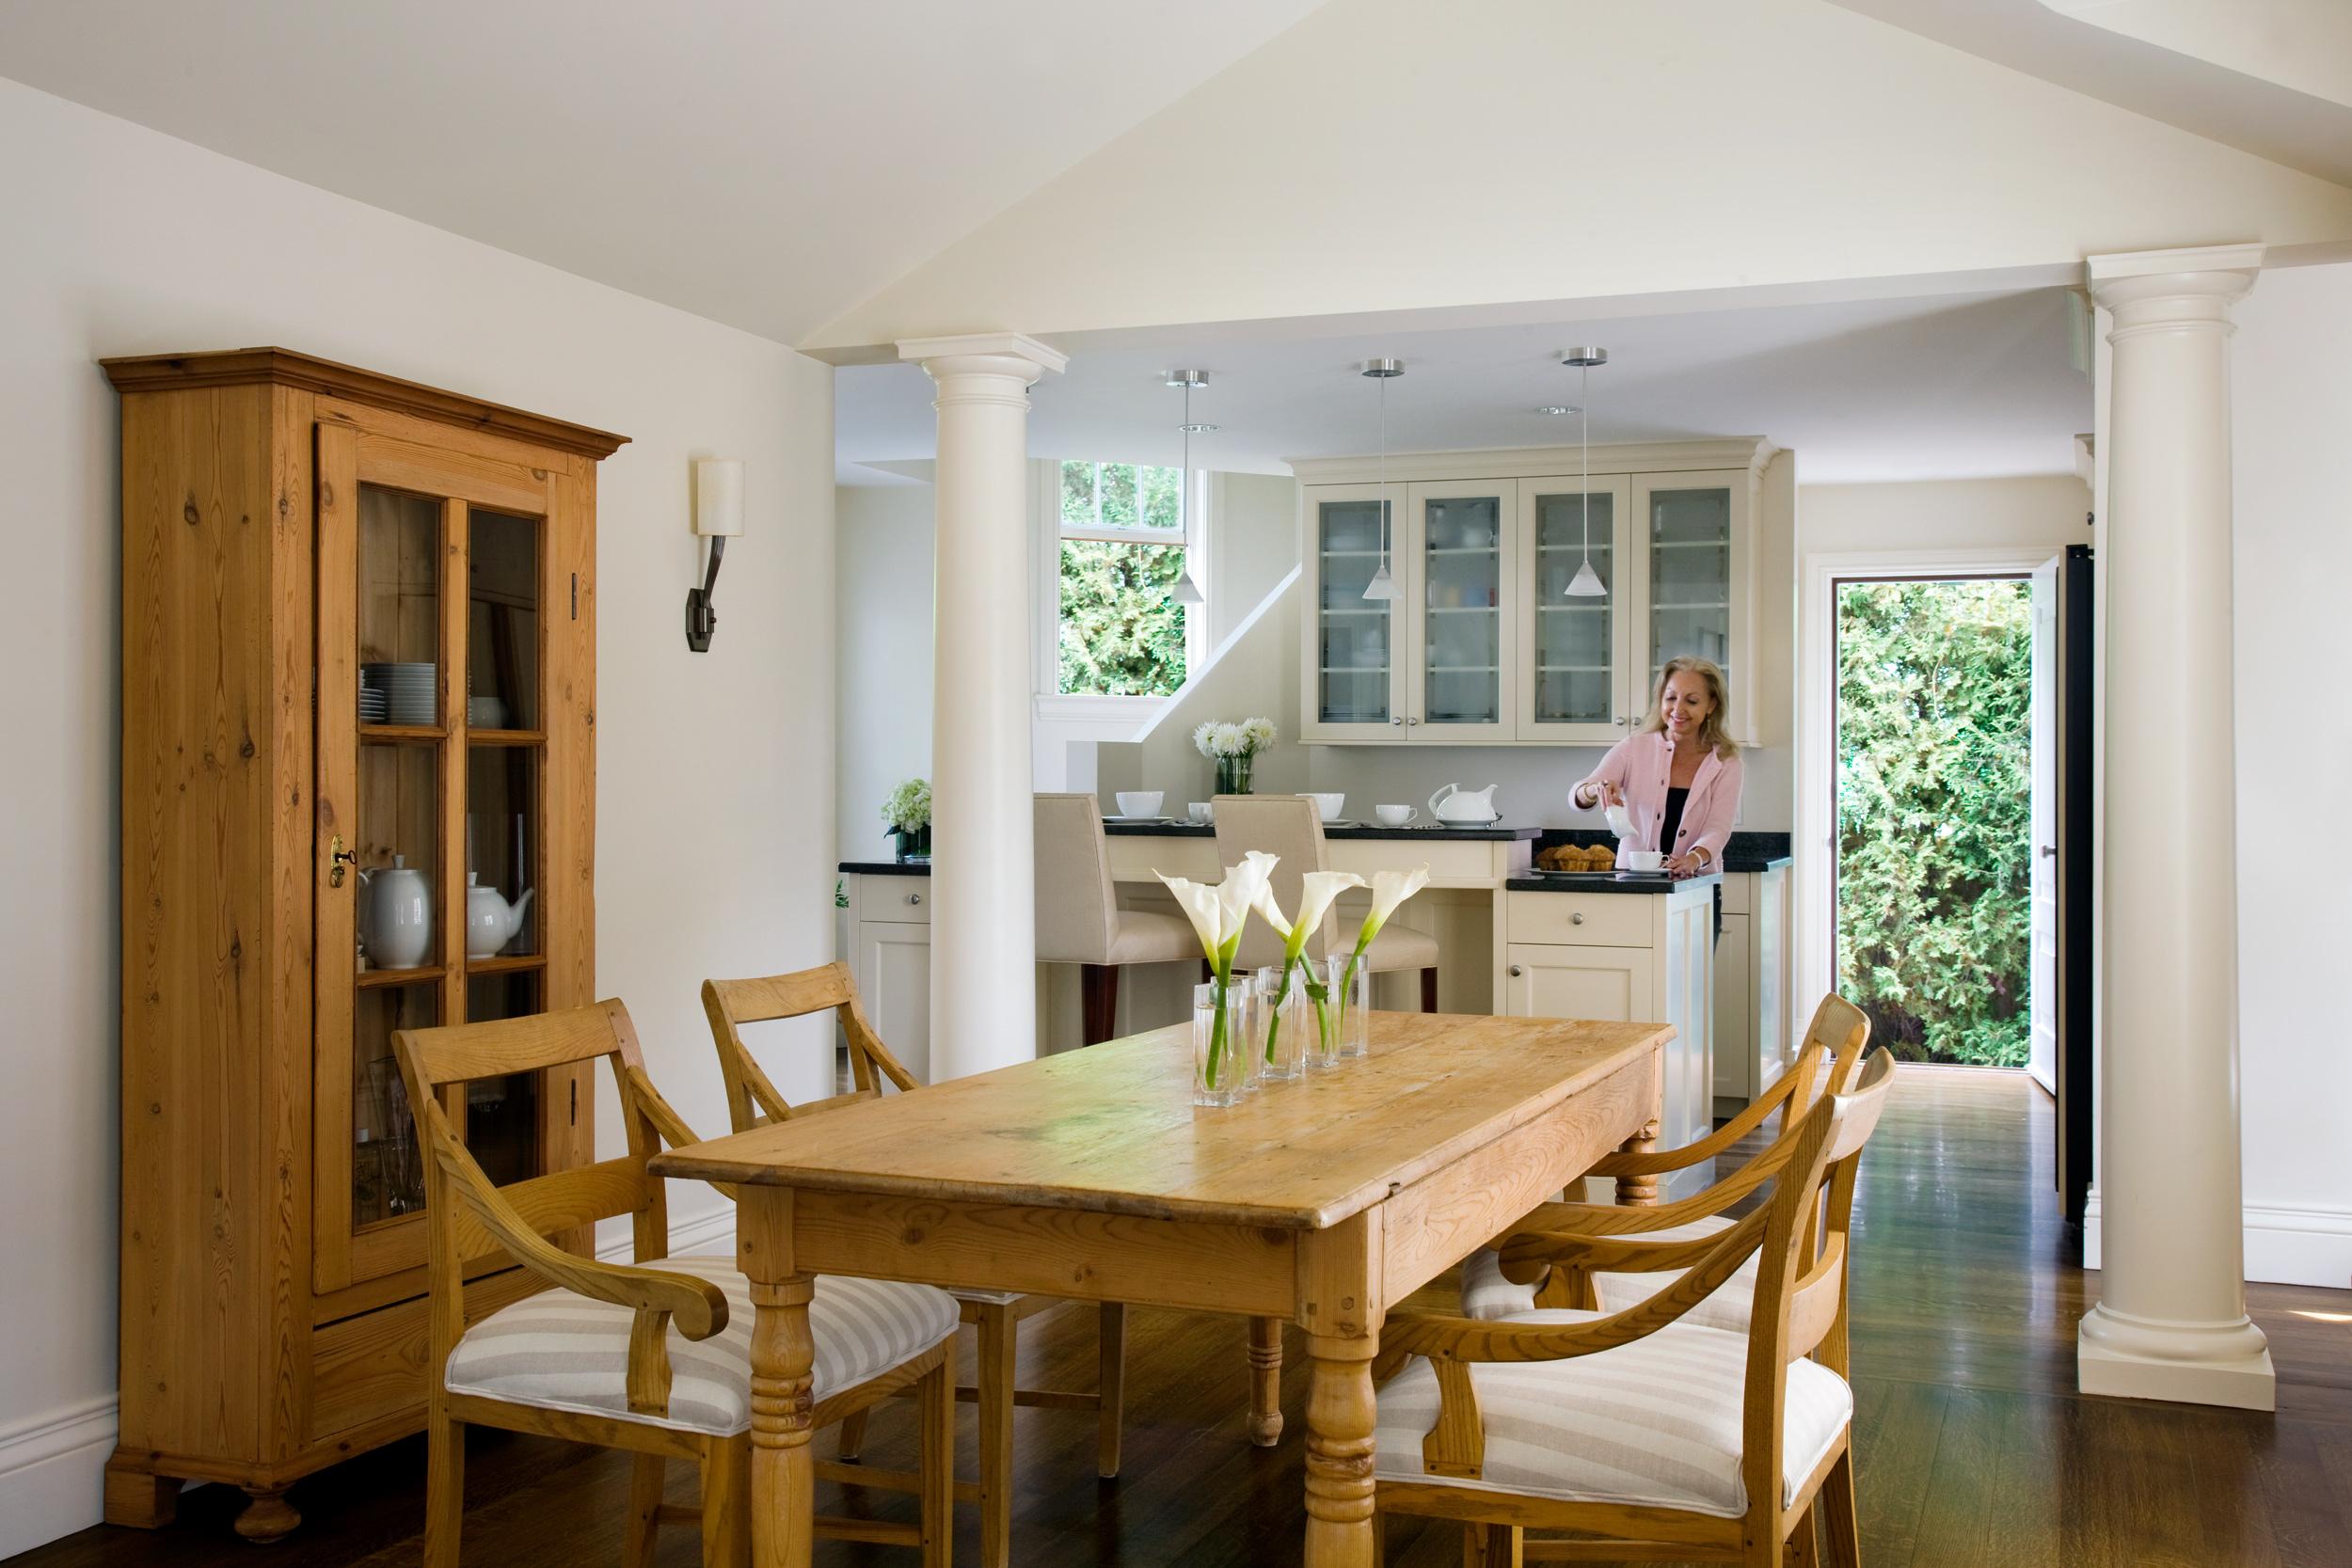 Cape_Cod_Doreve_kitchen_w_lady.jpg